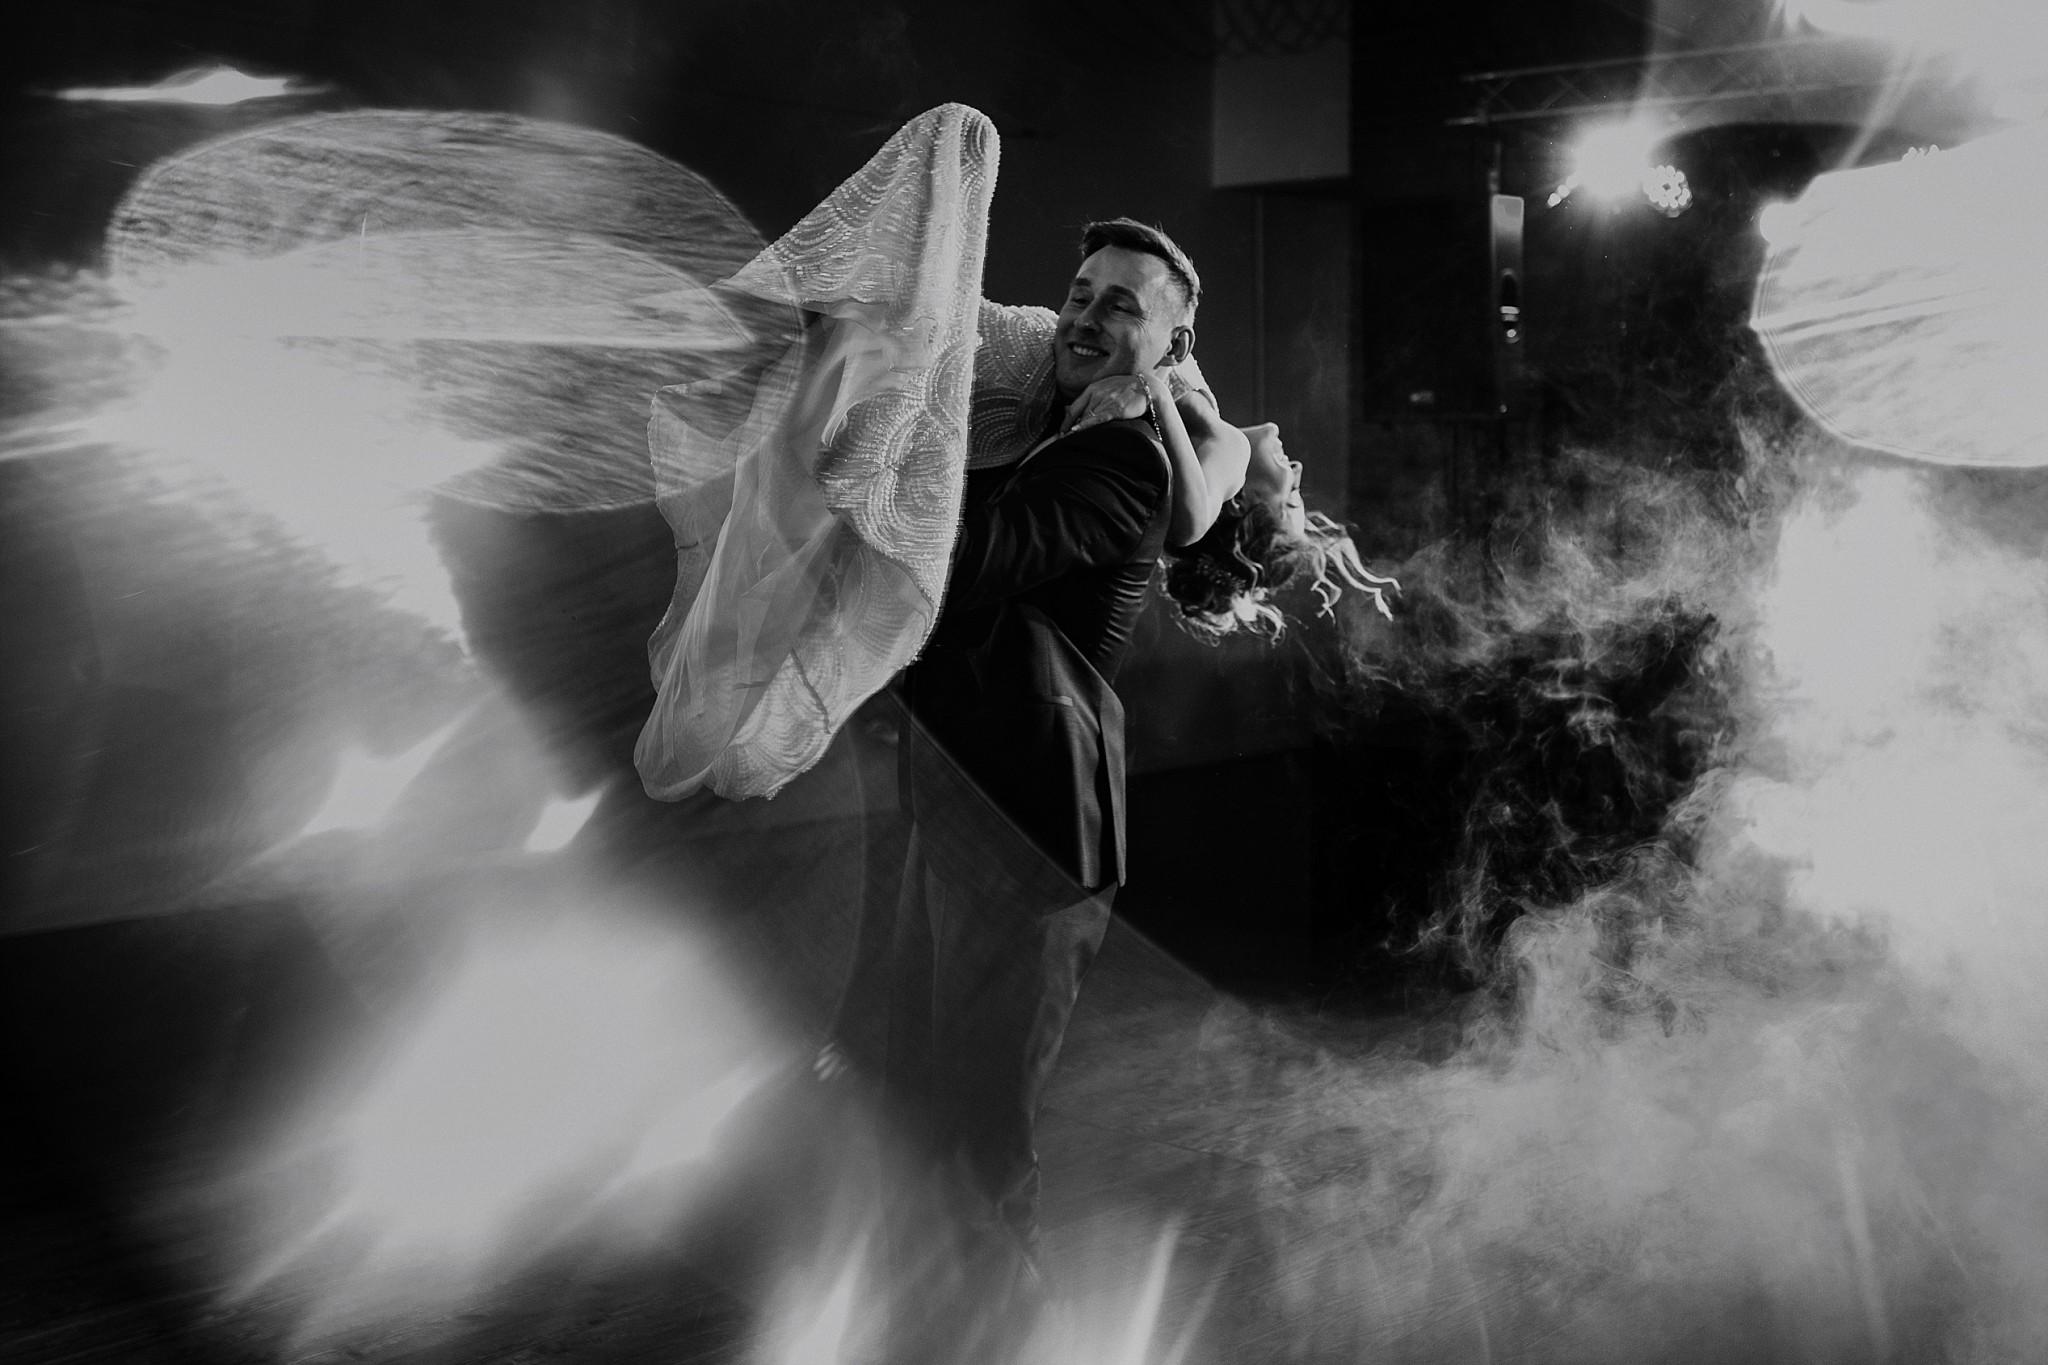 fotograf poznan wesele dobra truskawka piekne wesele pod poznaniem wesele w dobrej truskawce piekna para mloda slub marzen slub koronawirus slub listopad wesele koronawirus 321